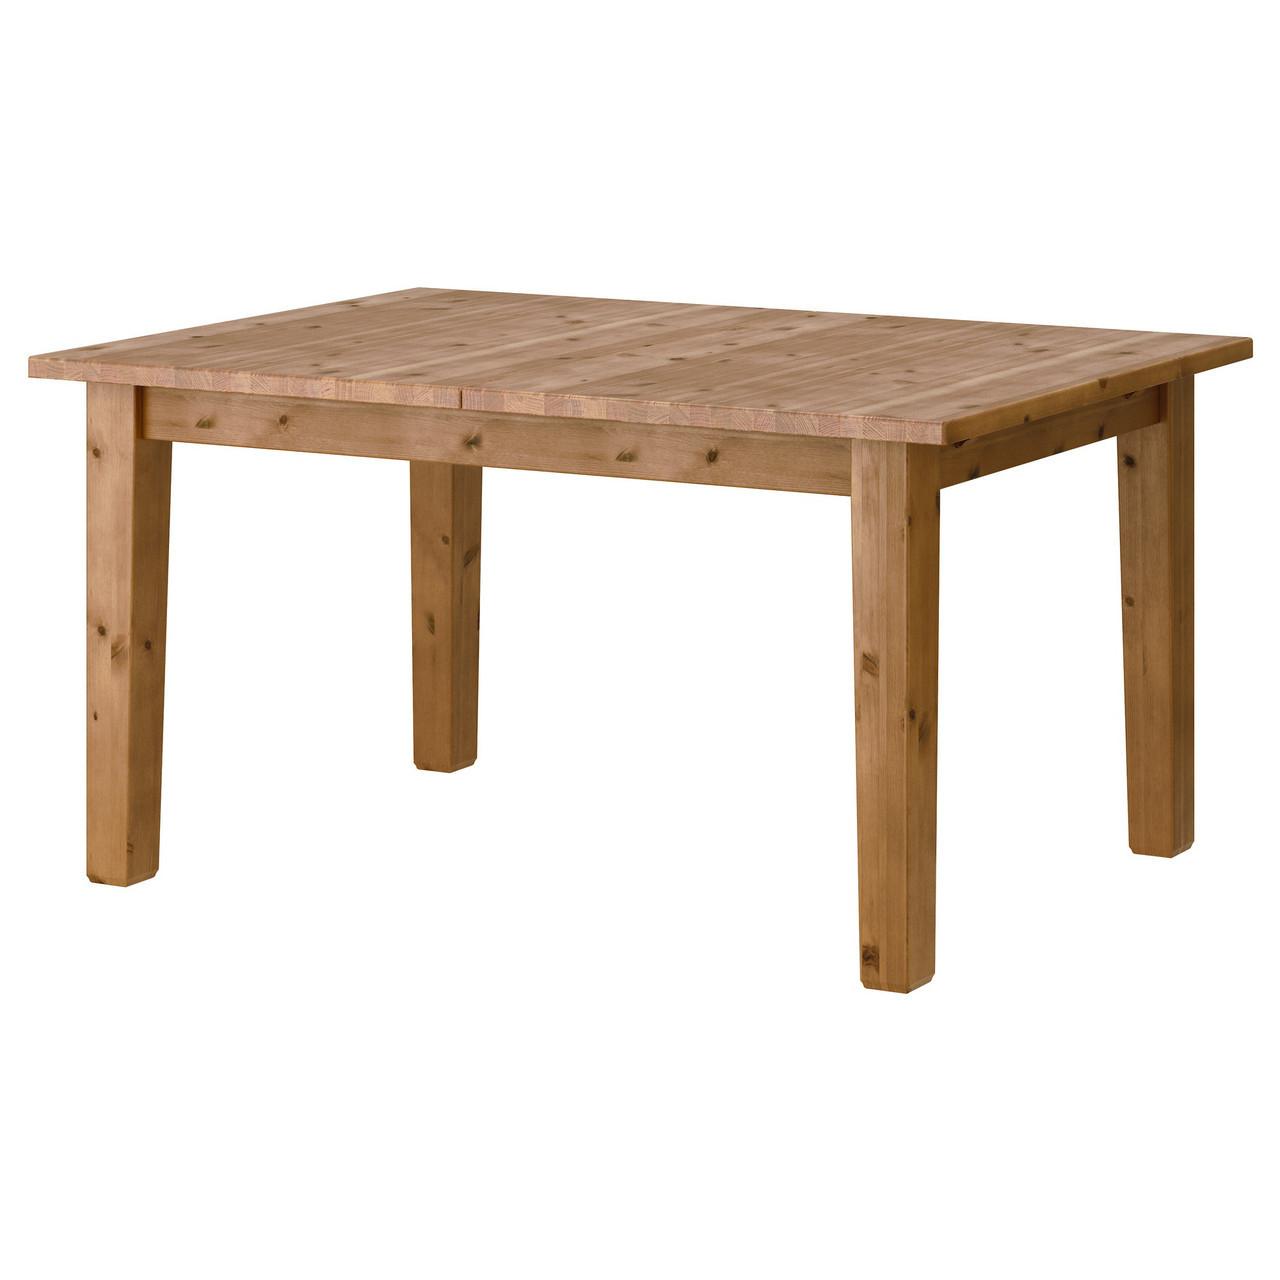 IKEA STORNAS (401.768.46) Раздвижной стол, пятно патины